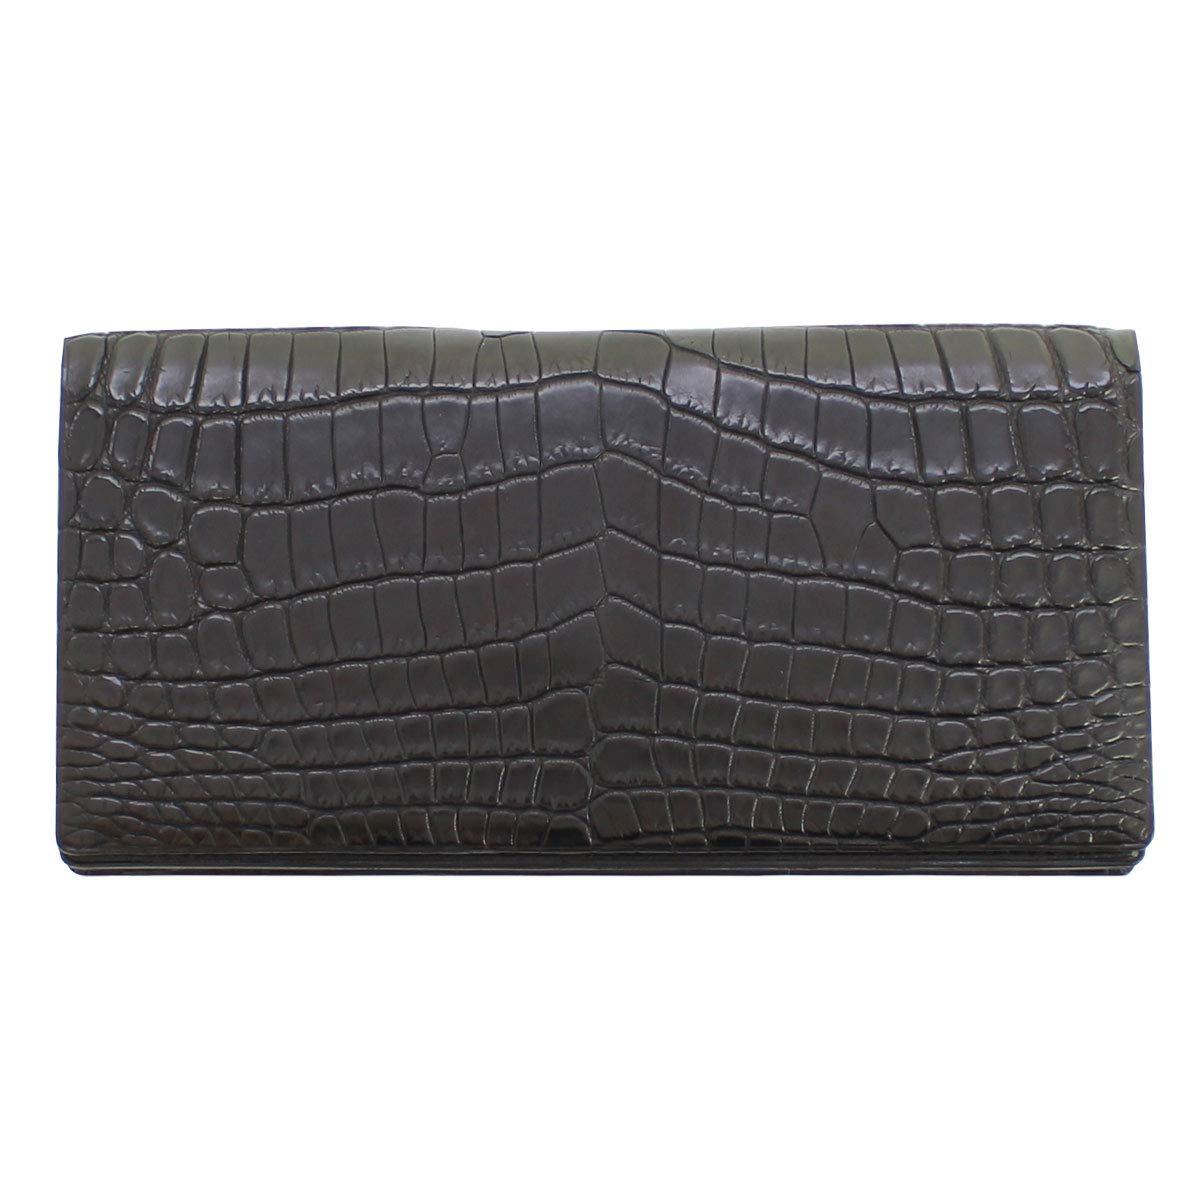 GREDEER クロコダイル 長財布(小銭入付) B07MN2J5PK ブラック